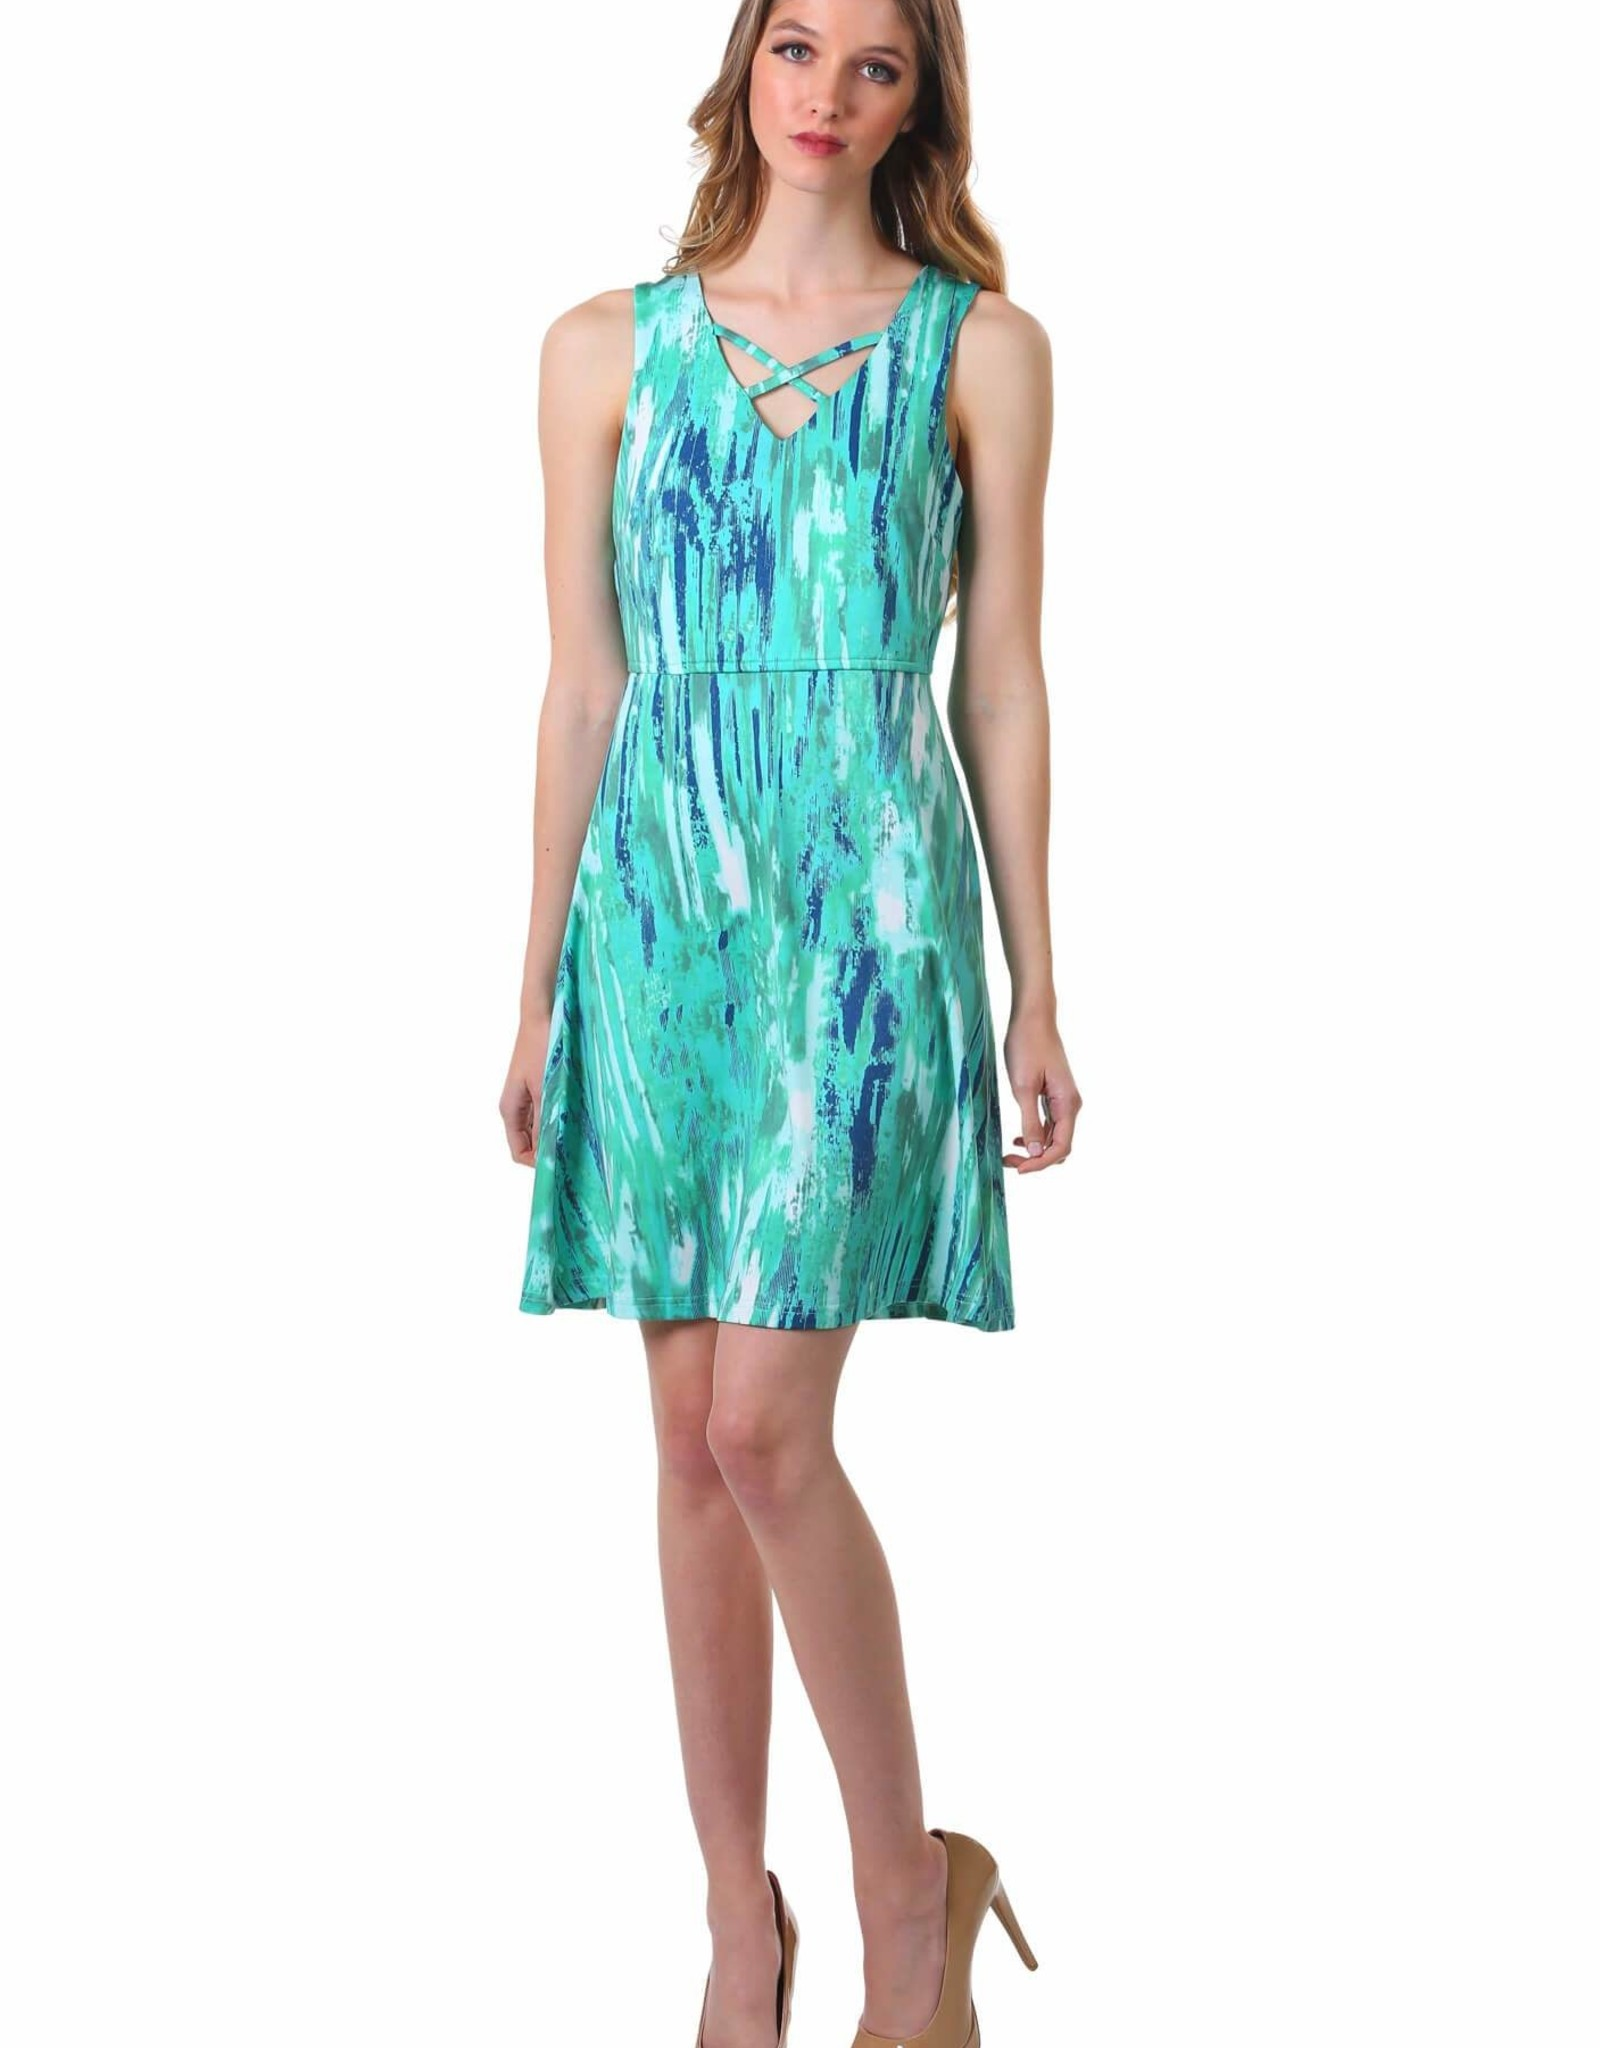 - Green Print Criss Cross V-Neck Fit & Flare Tank Dress